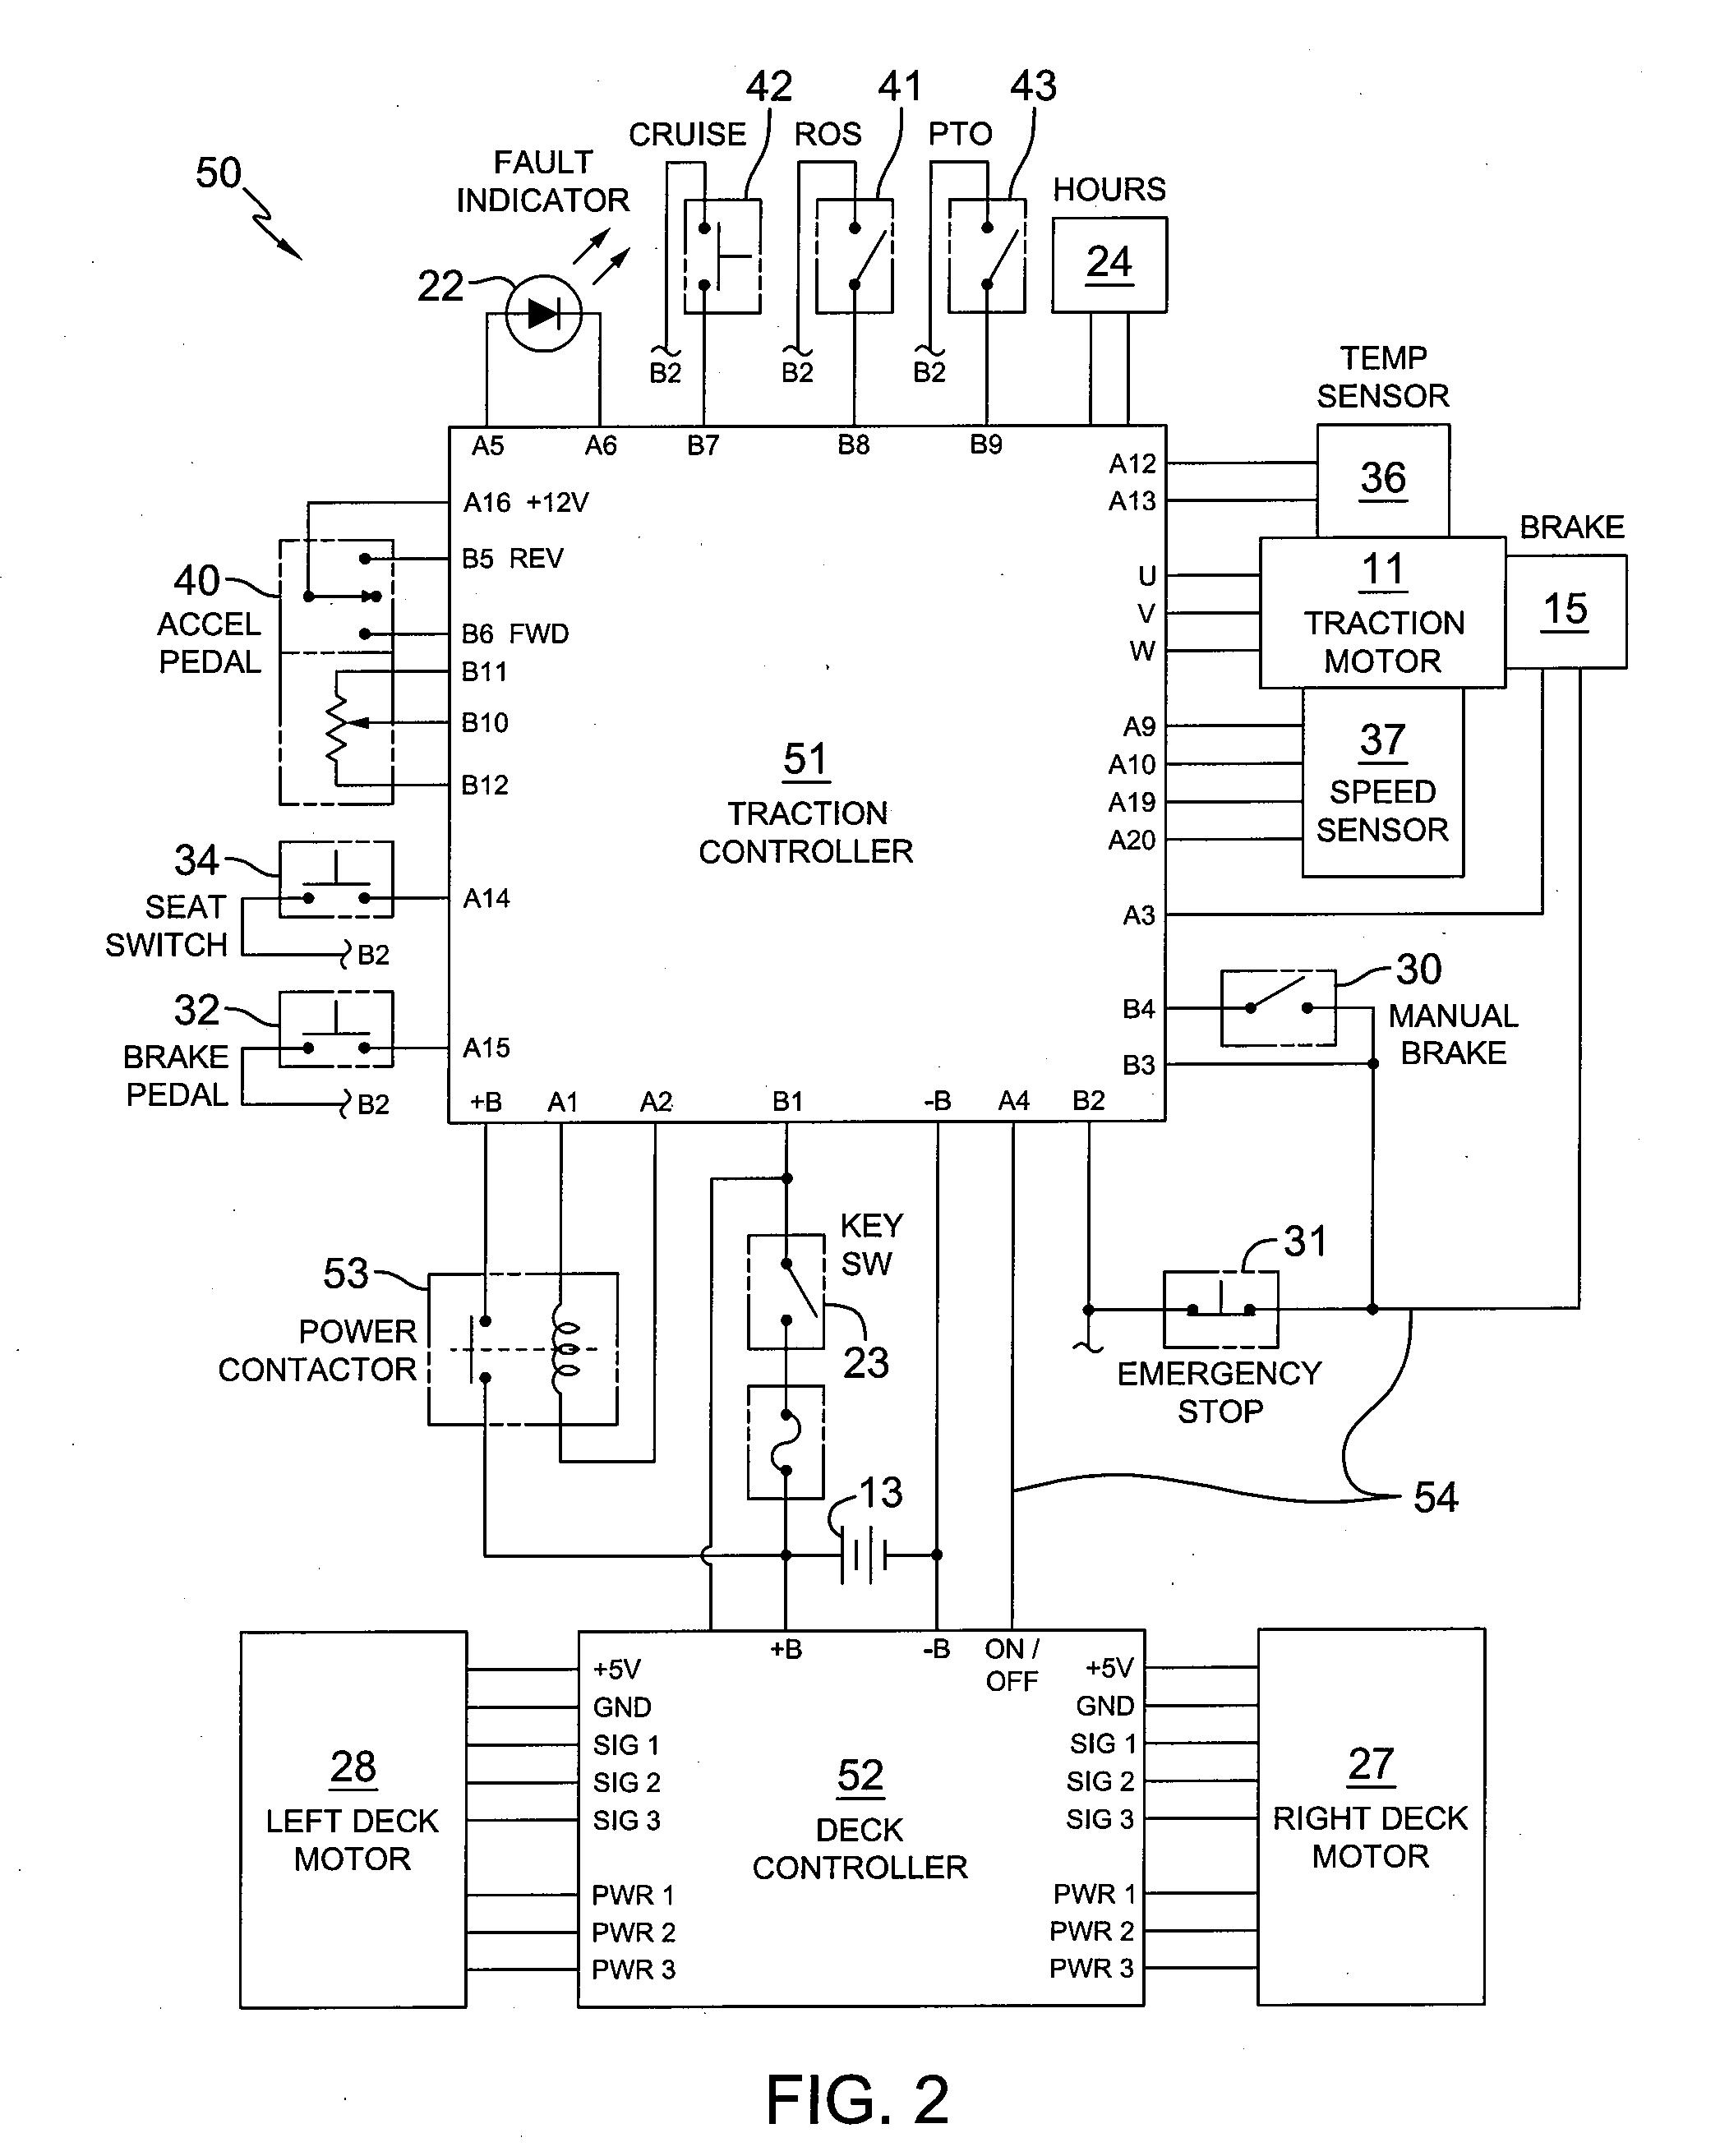 Awesome toro zero turn wiring diagram contemporary wiring diagram